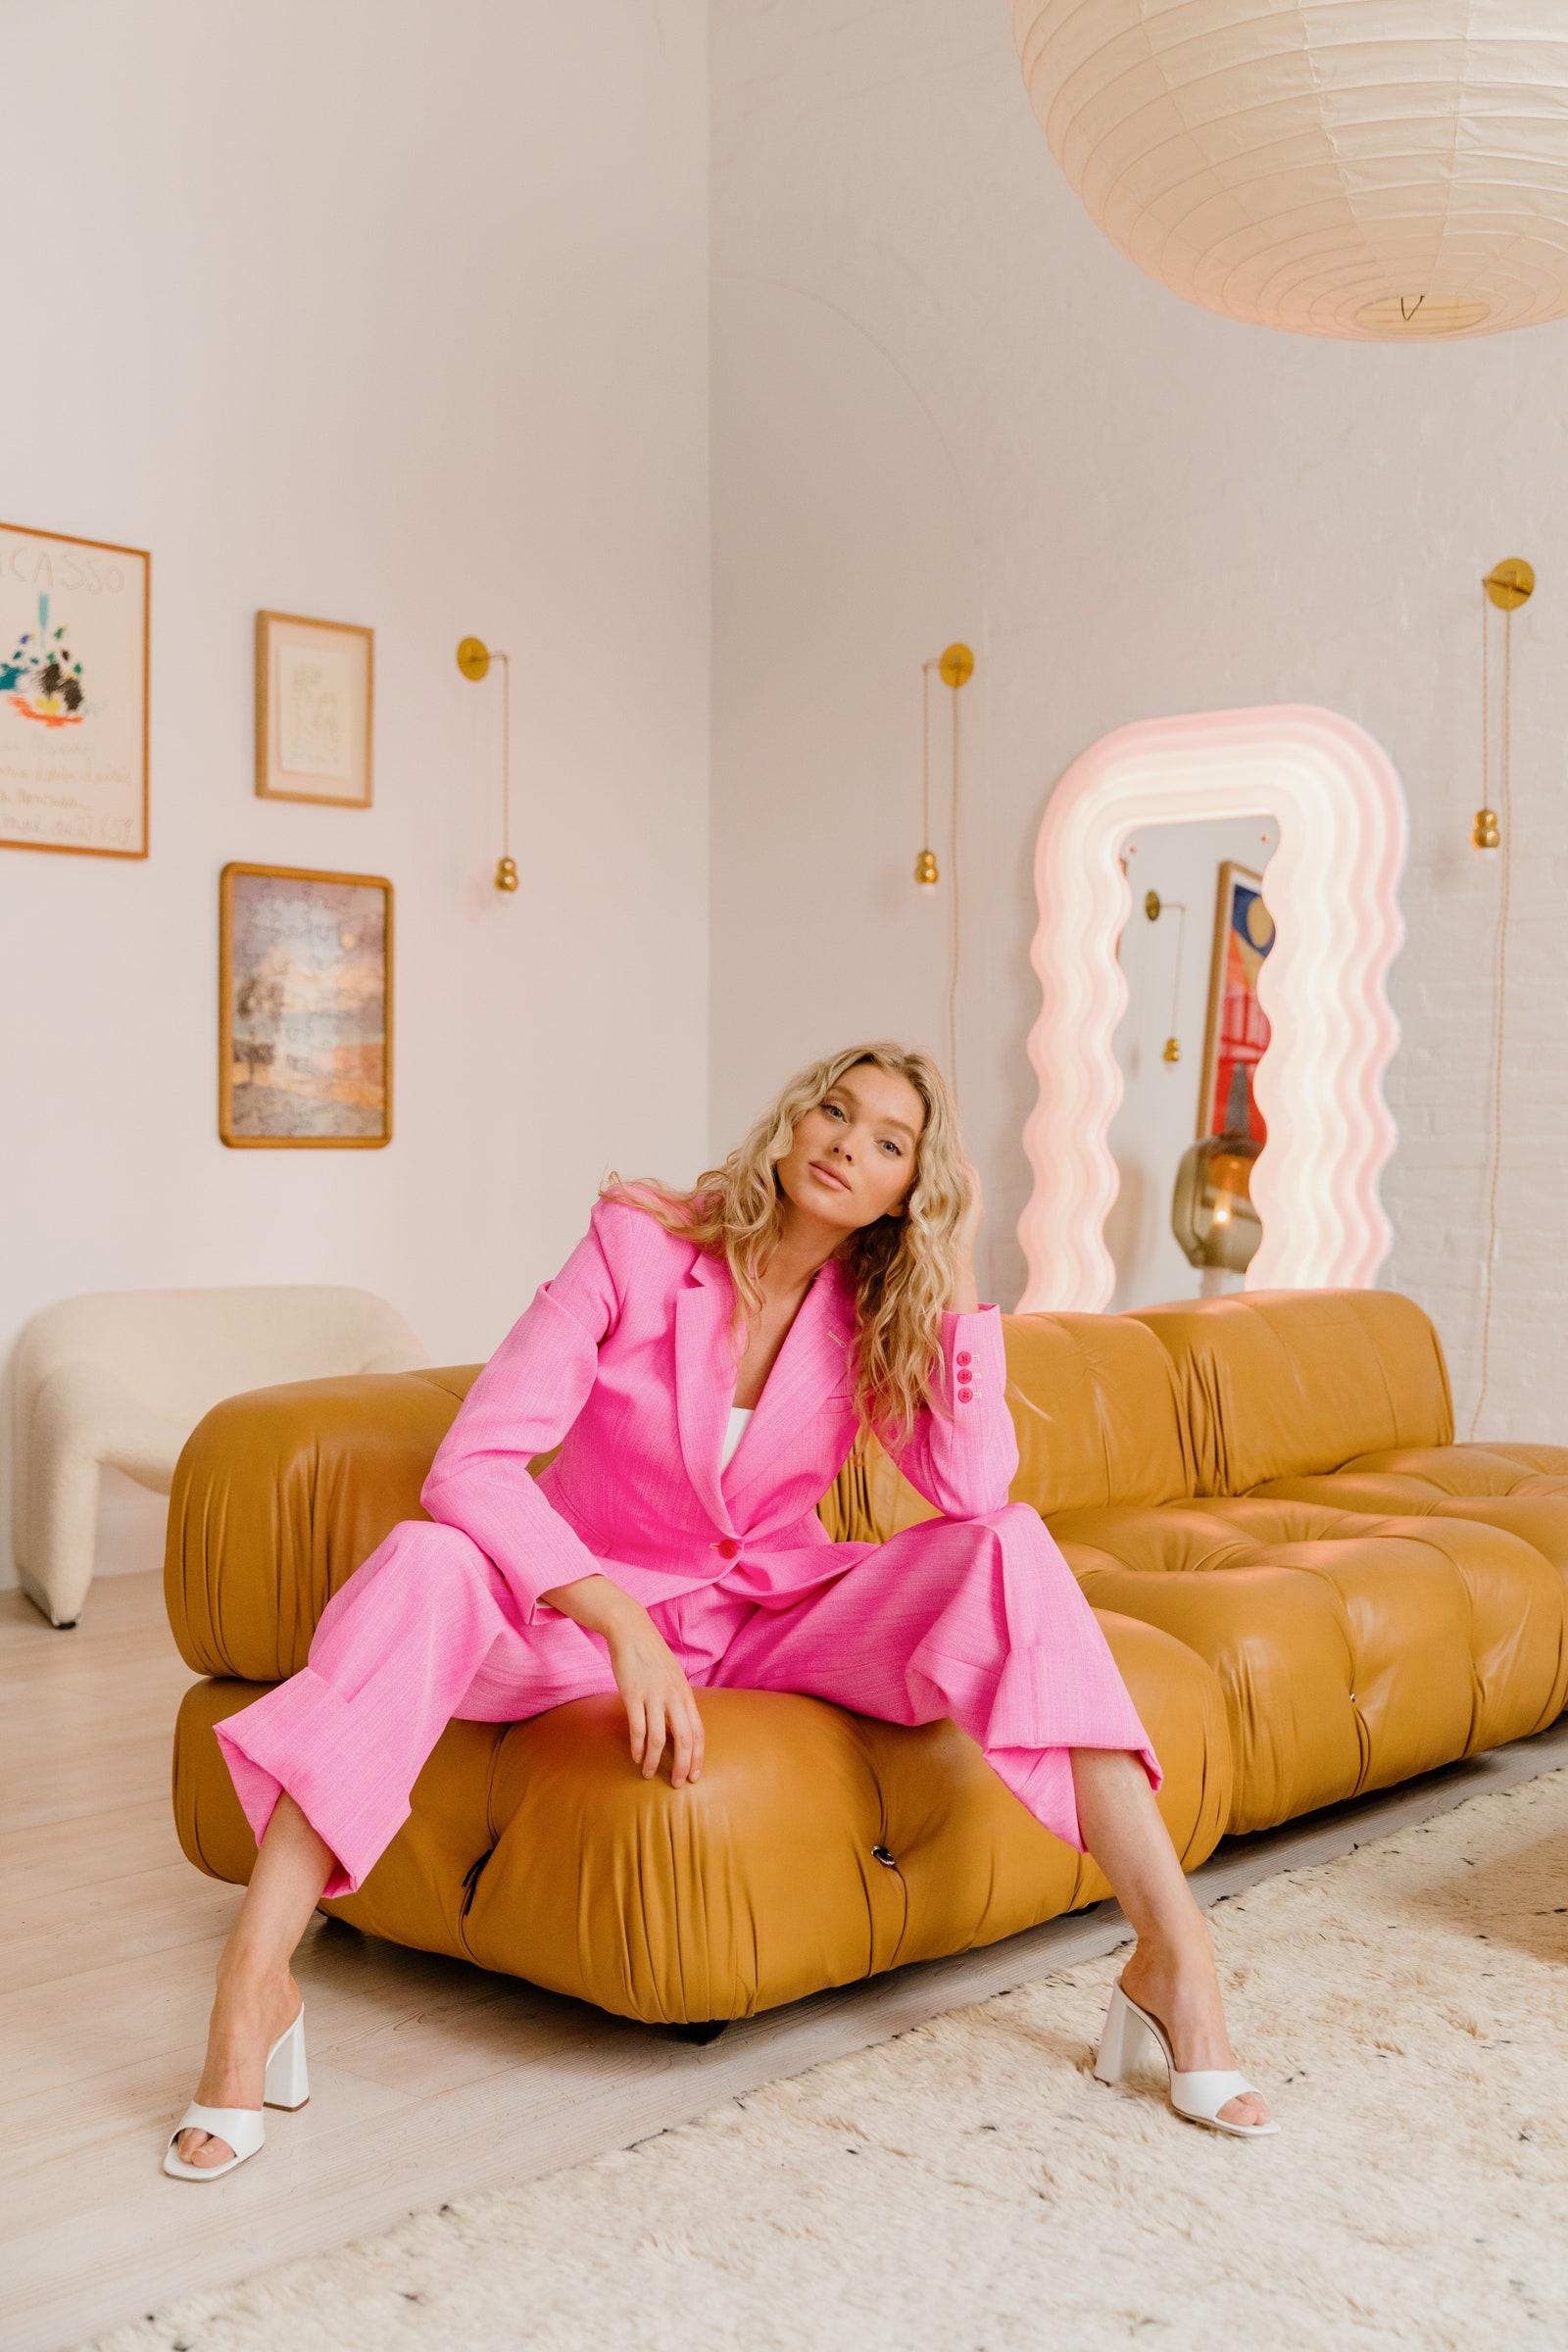 Decor Inspiration | At Home With: Elsa Hosk, Soho, New York